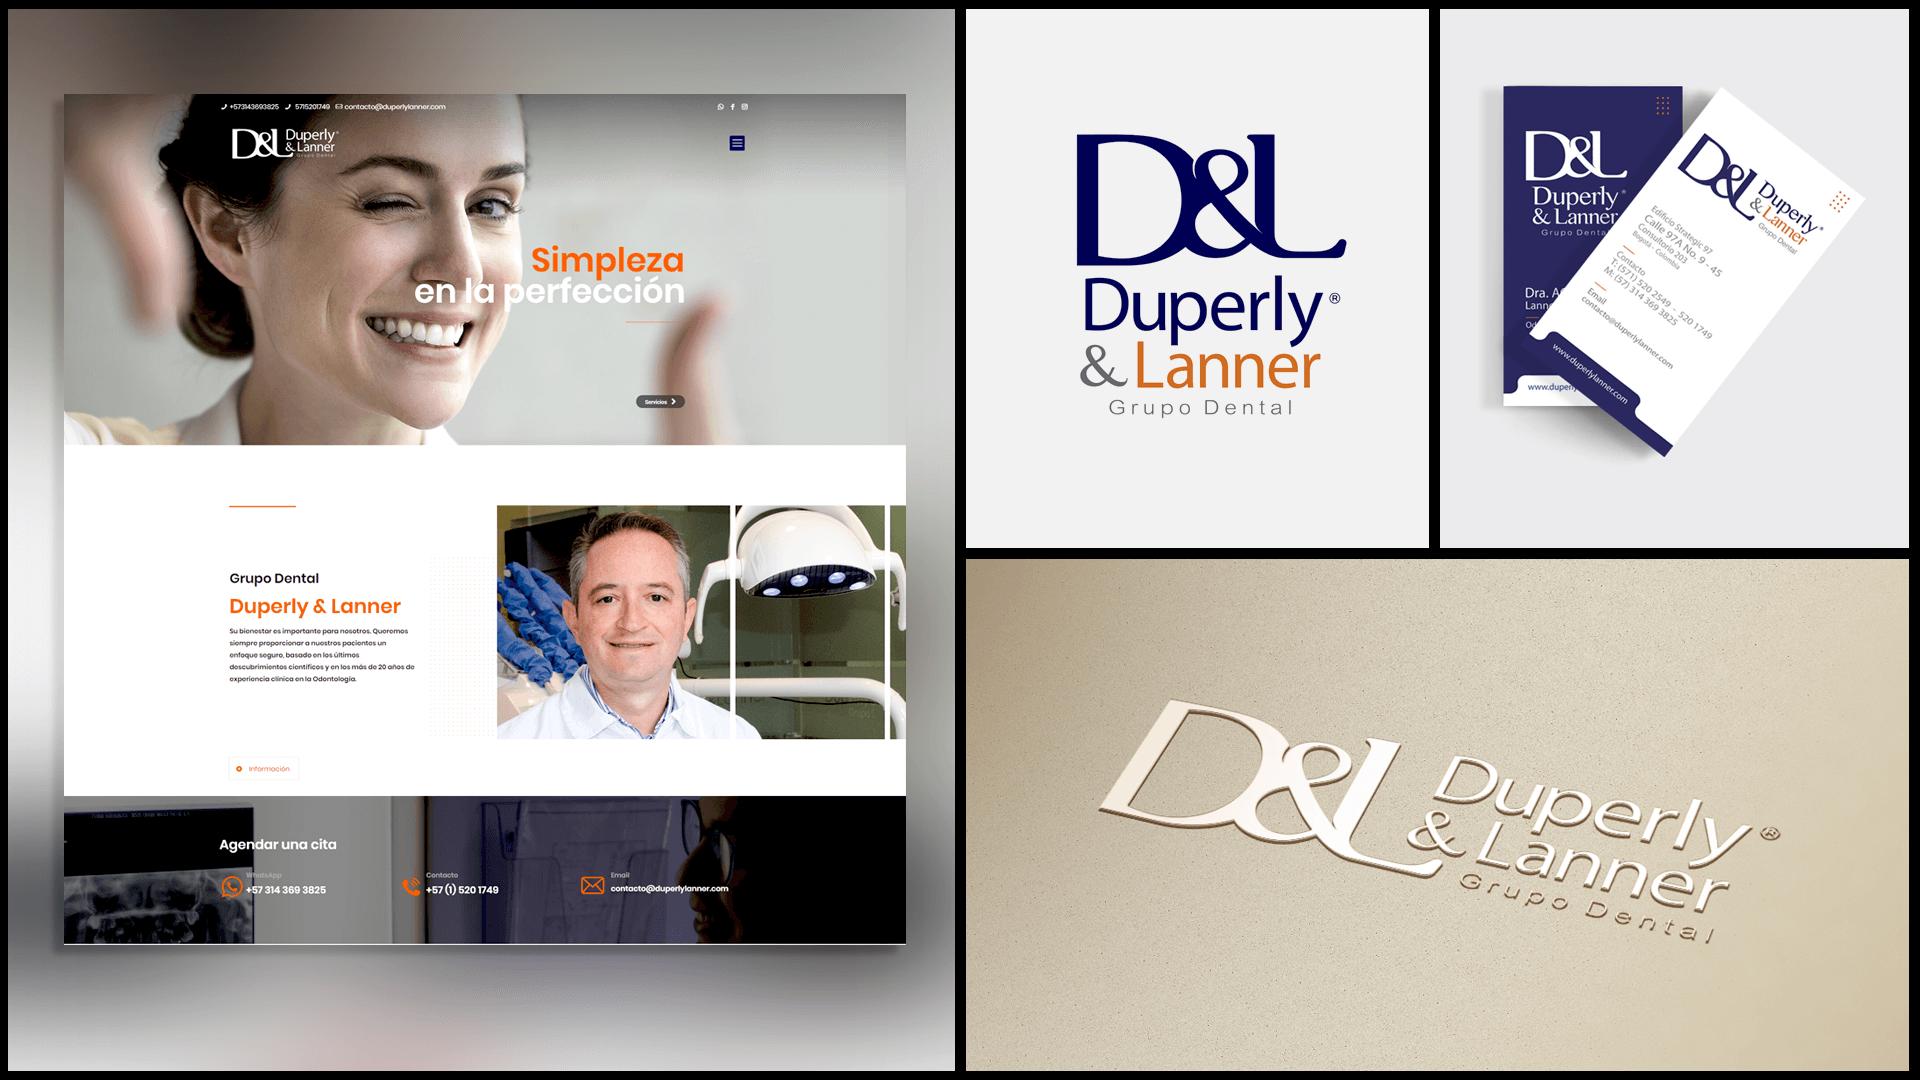 Duperly_&_lanner_cerjuca_grafico_diseño